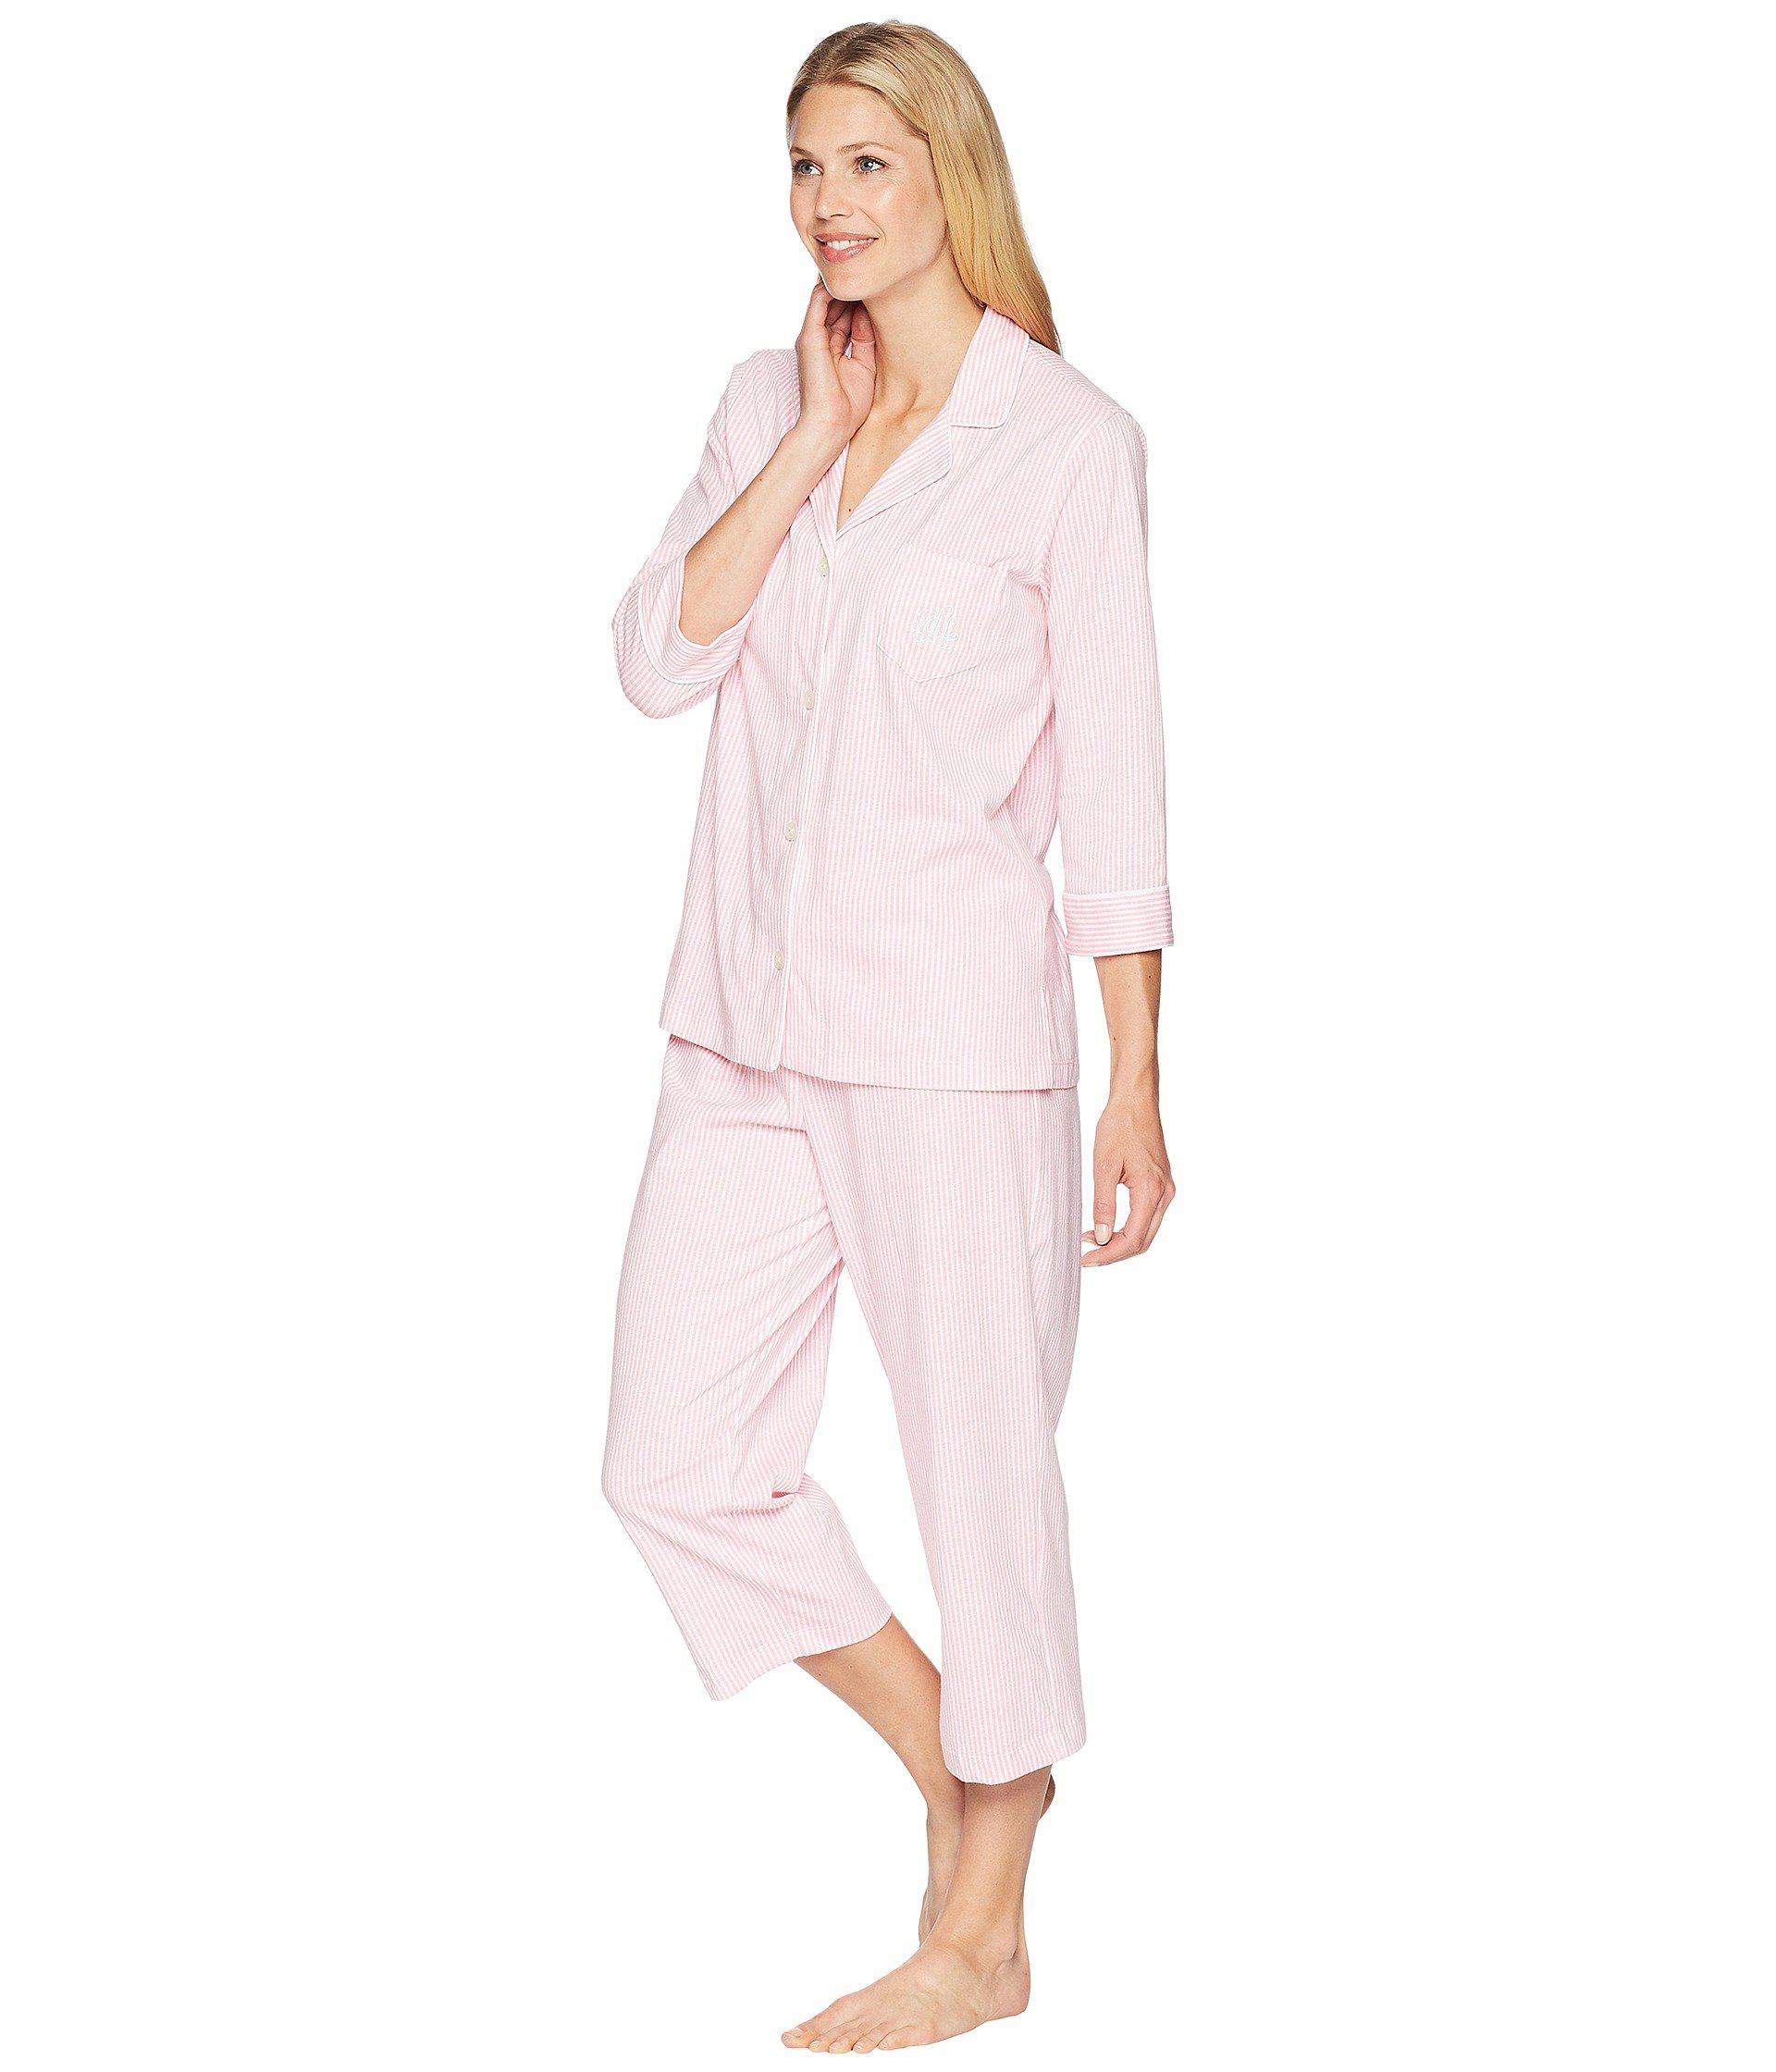 73d293c3be Lyst - Lauren by Ralph Lauren Essentials Bingham Knits Capri Pj Set (blue  Paisley) Women s Pajama Sets in Pink